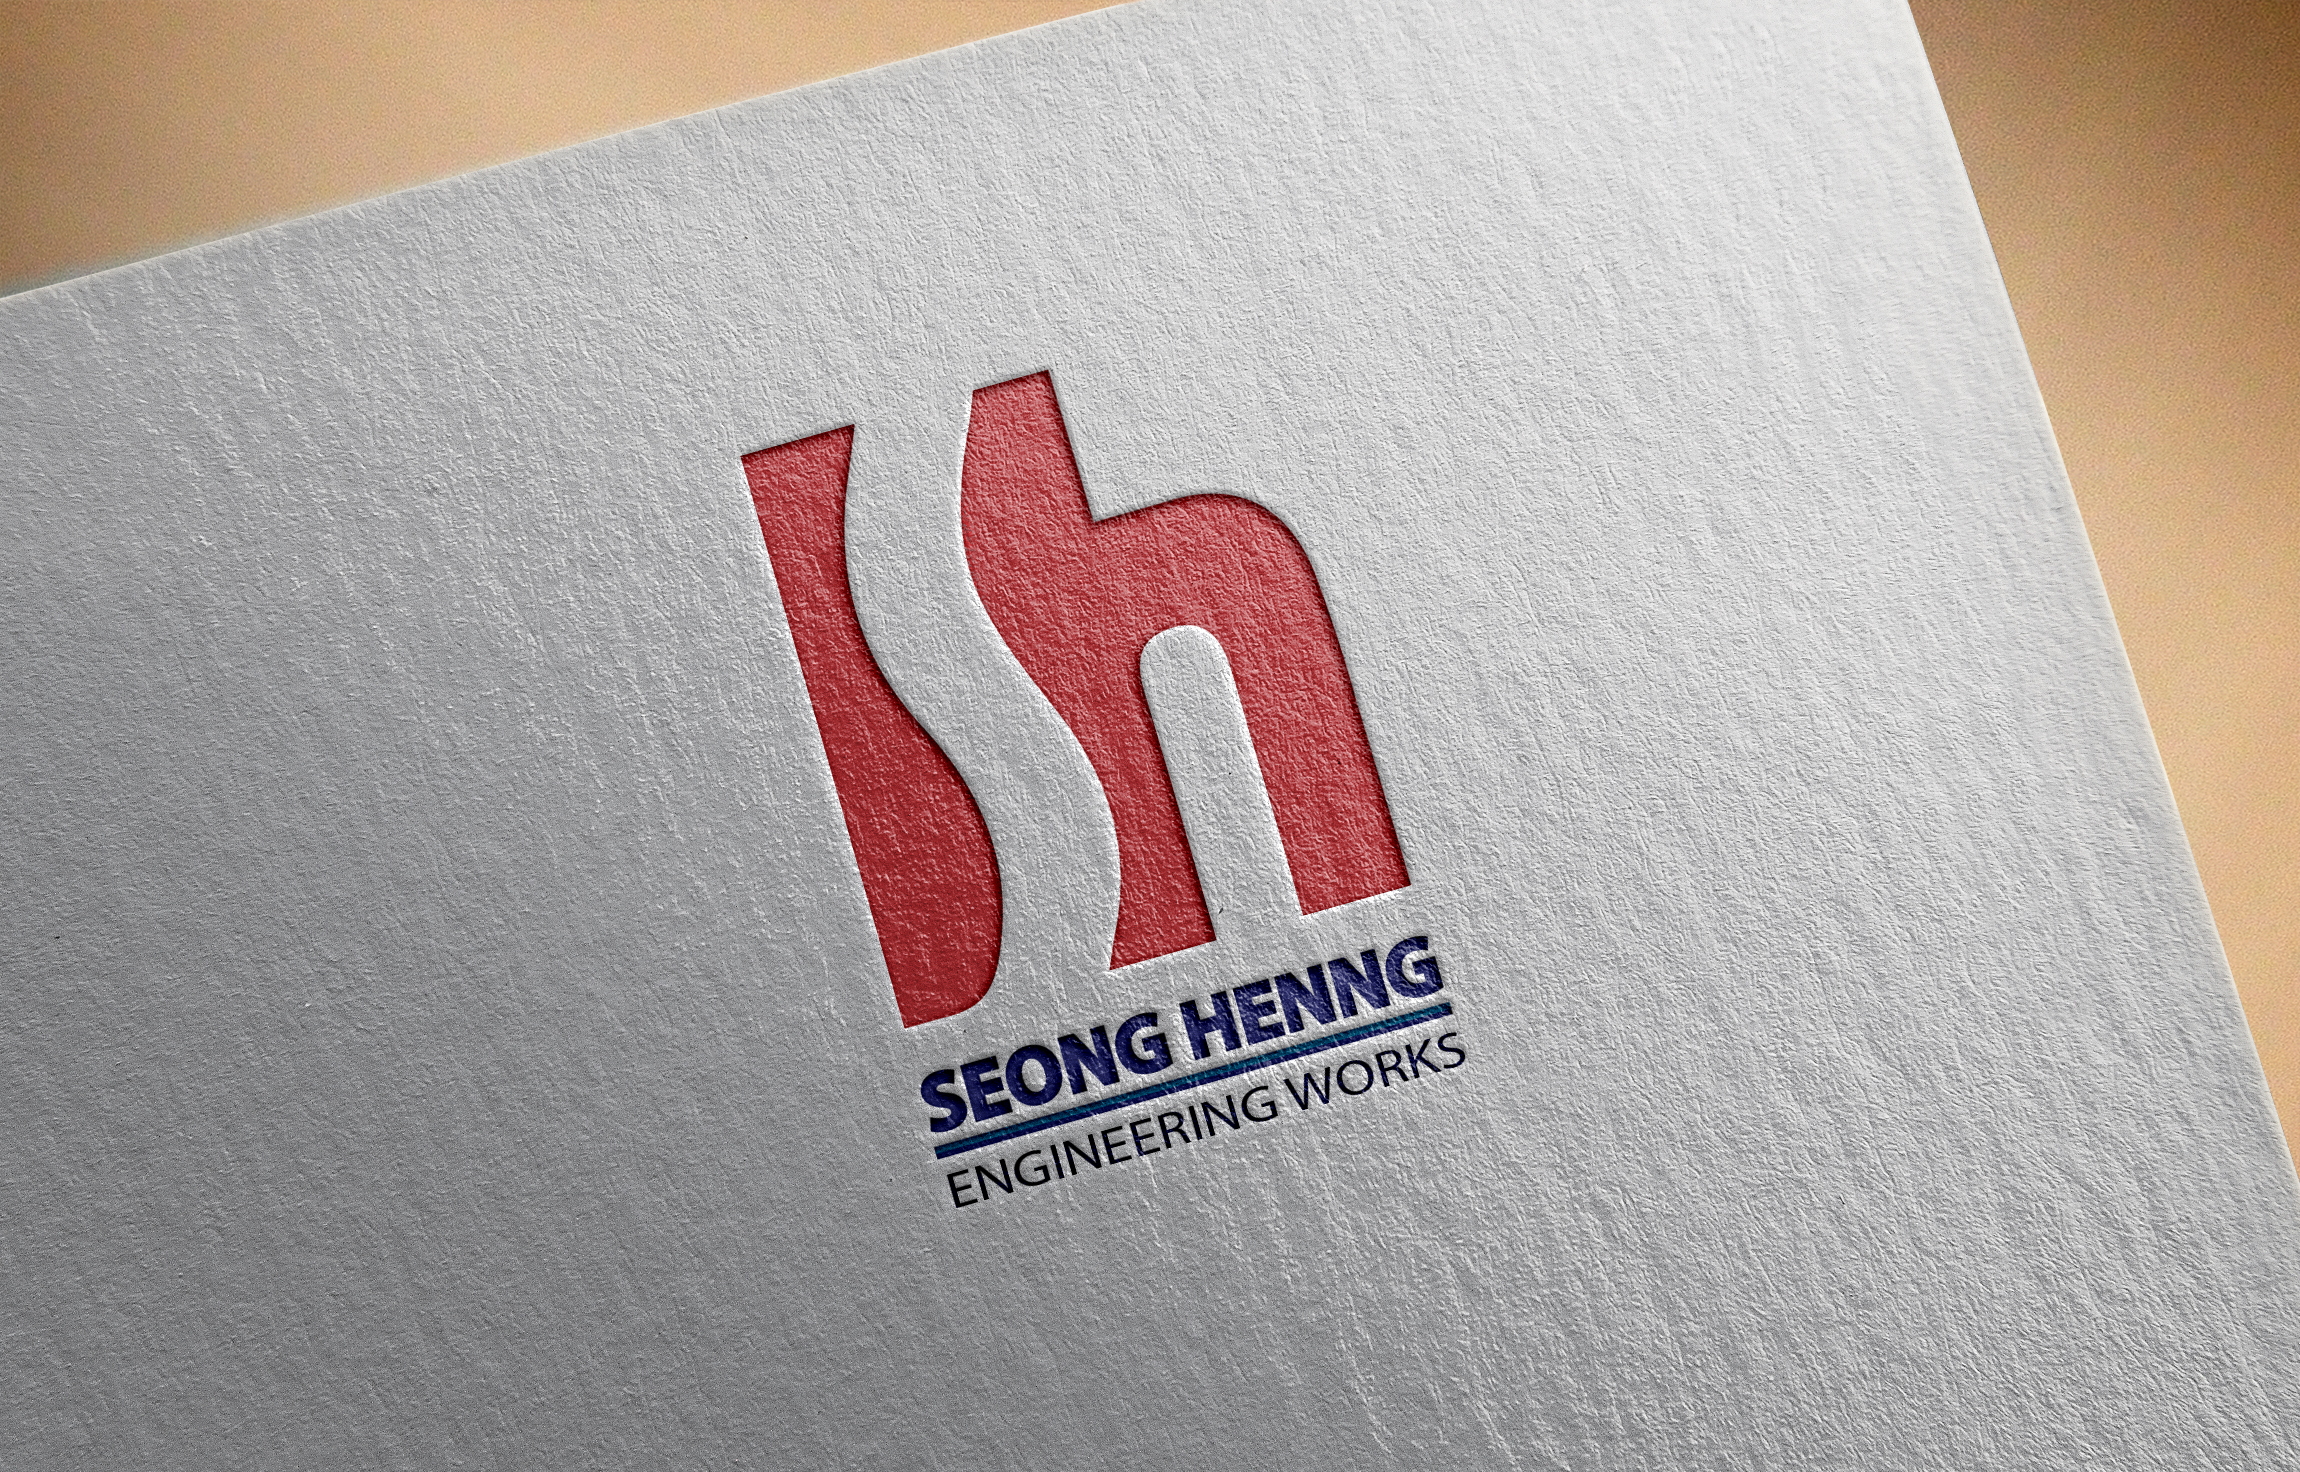 Seong Henng Engineering Works (M) Sdn Bhd